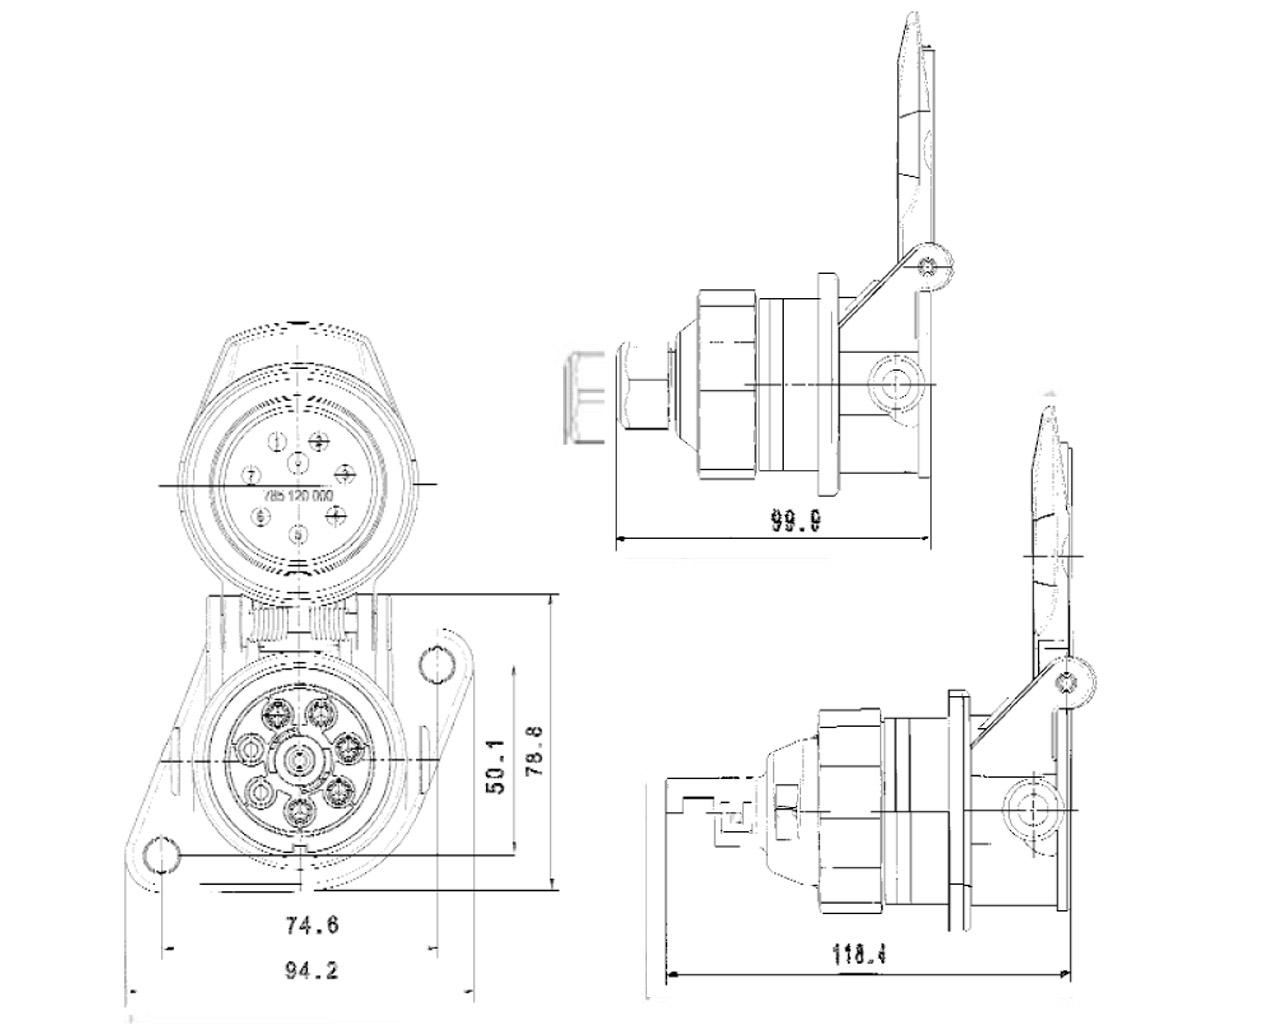 EBS-Steckdose 7-polig - Plastimat GmbH